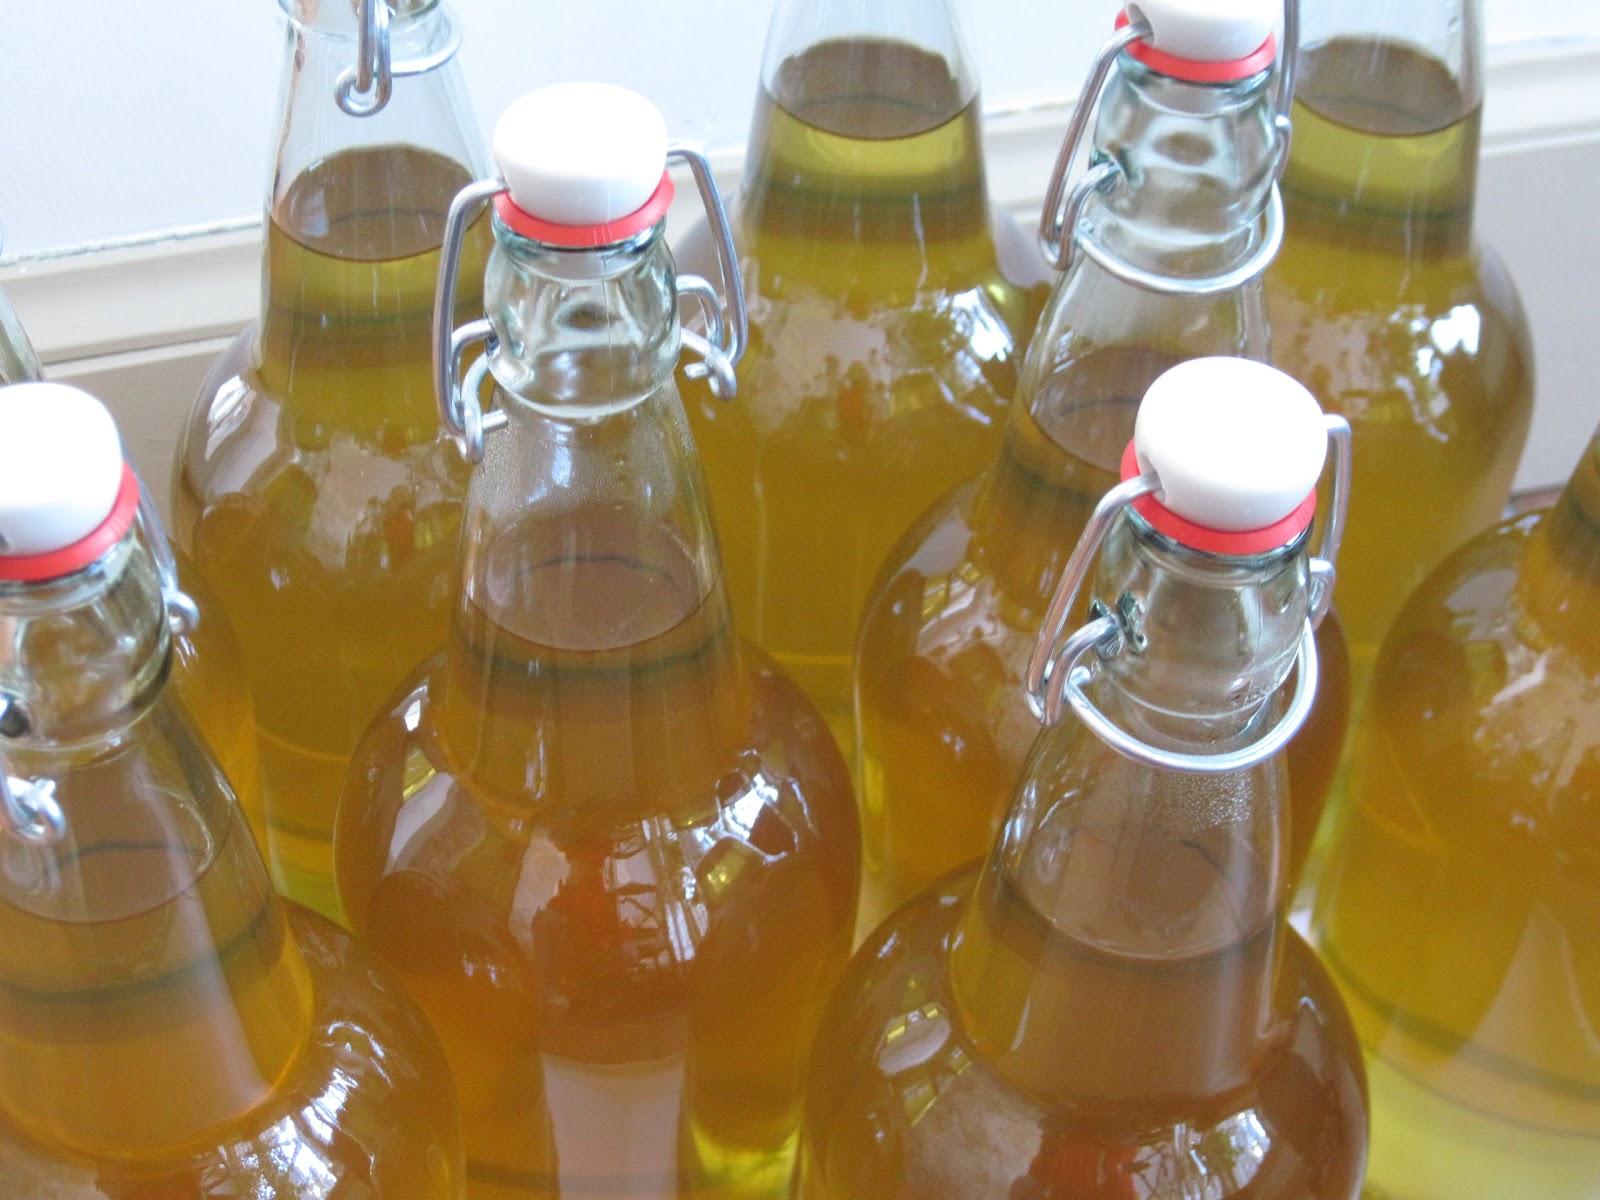 How to make cider Making cider at home: recipes 89